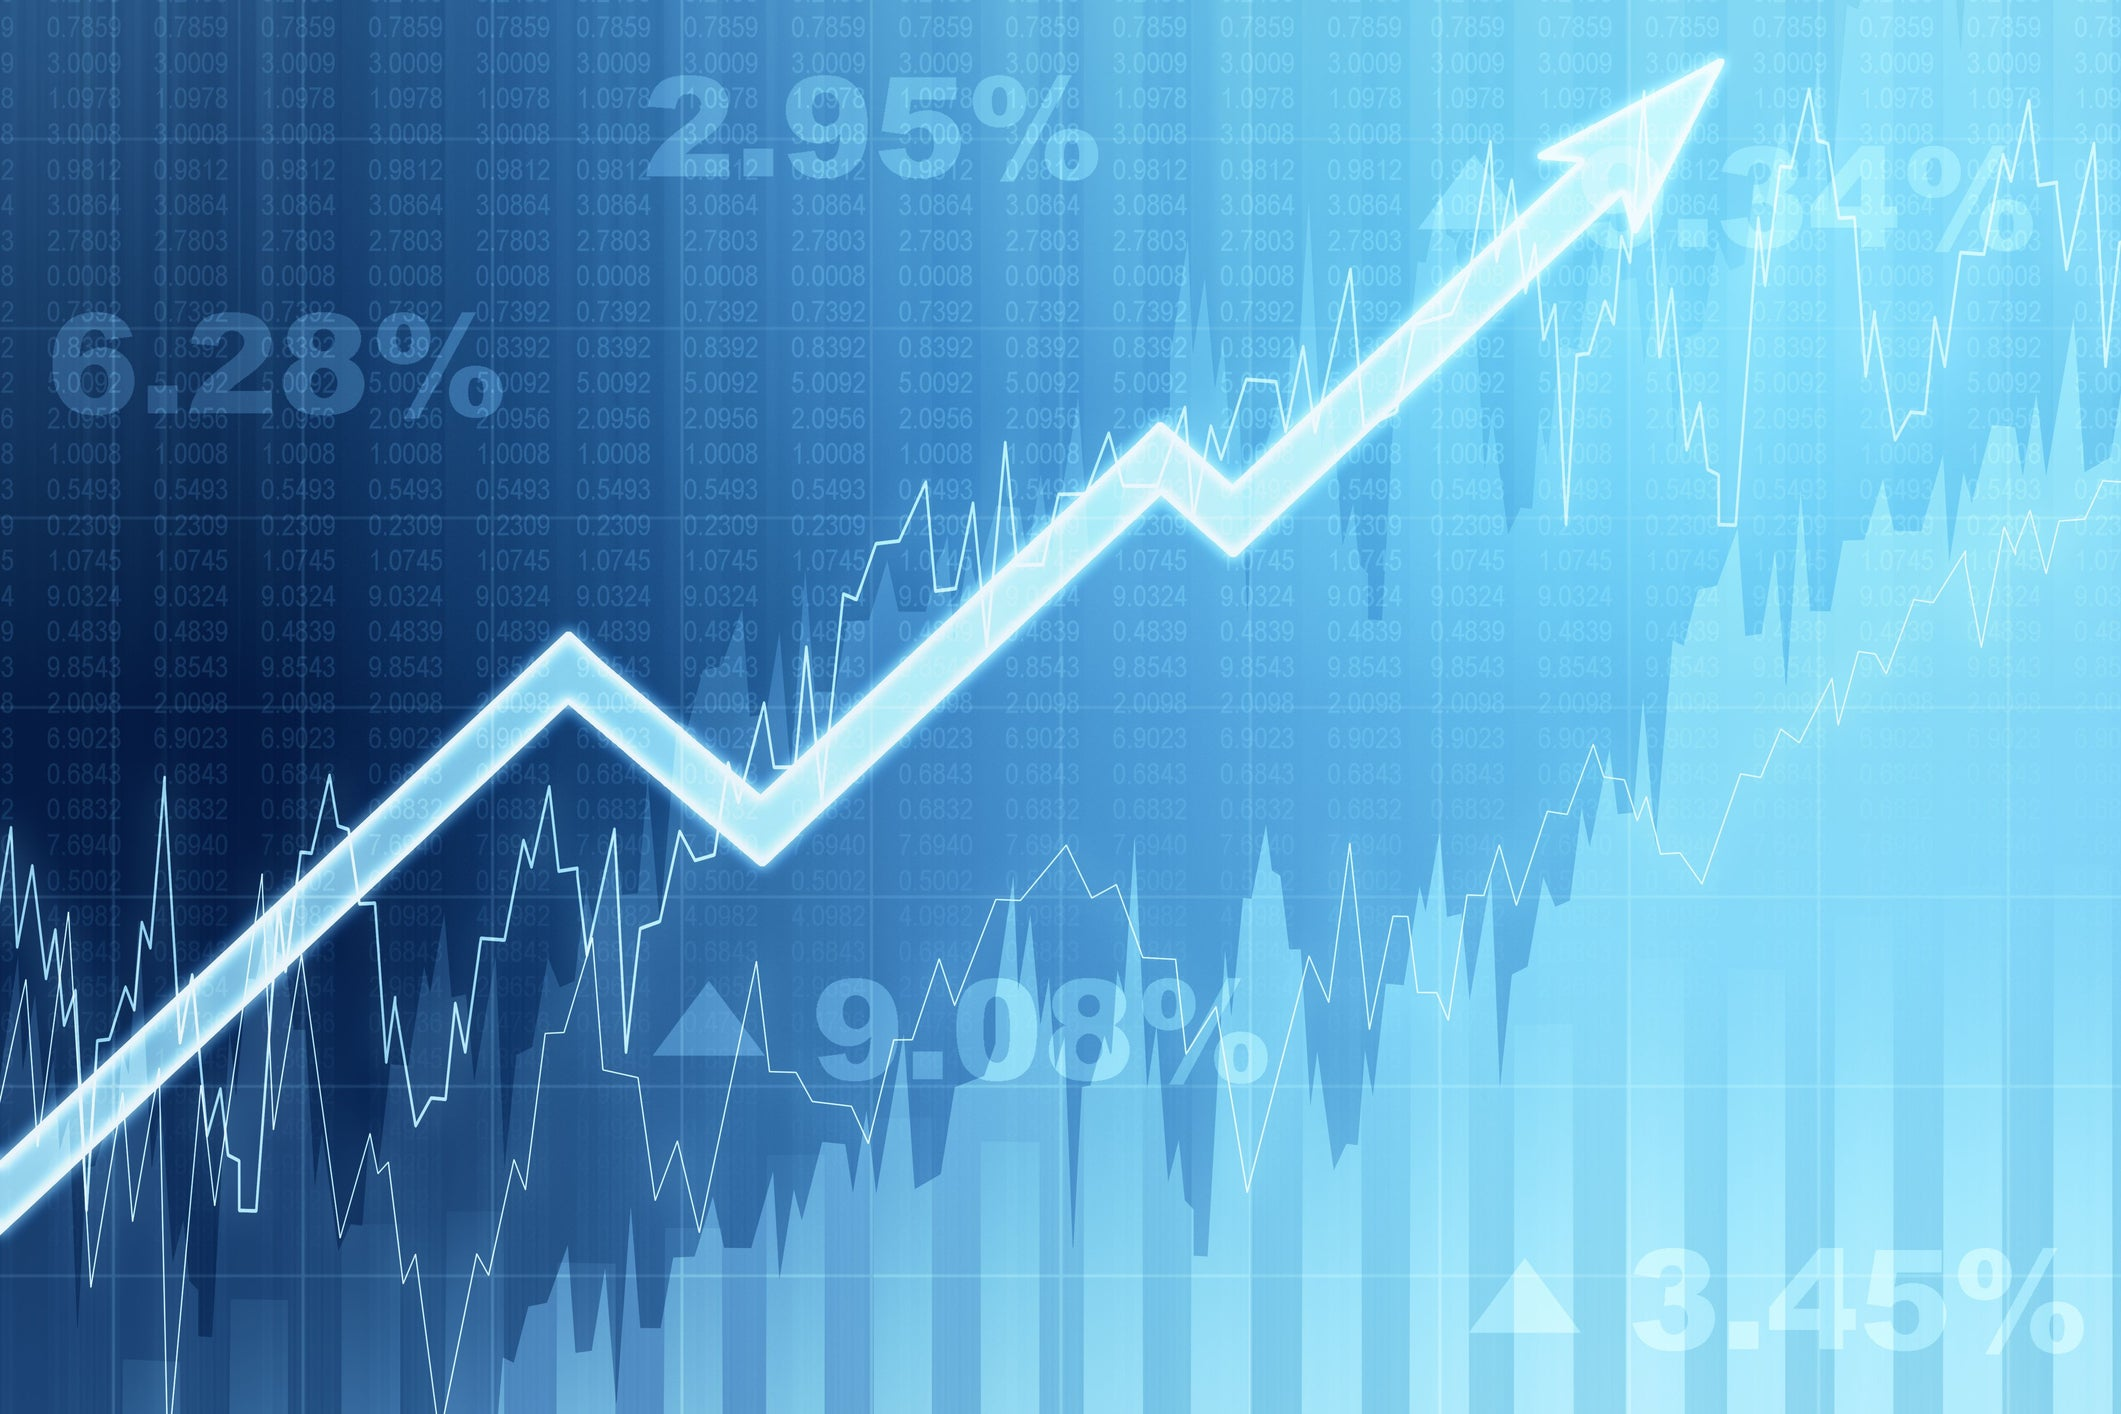 Biontech Se Bntx Stock Price News The Motley Fool